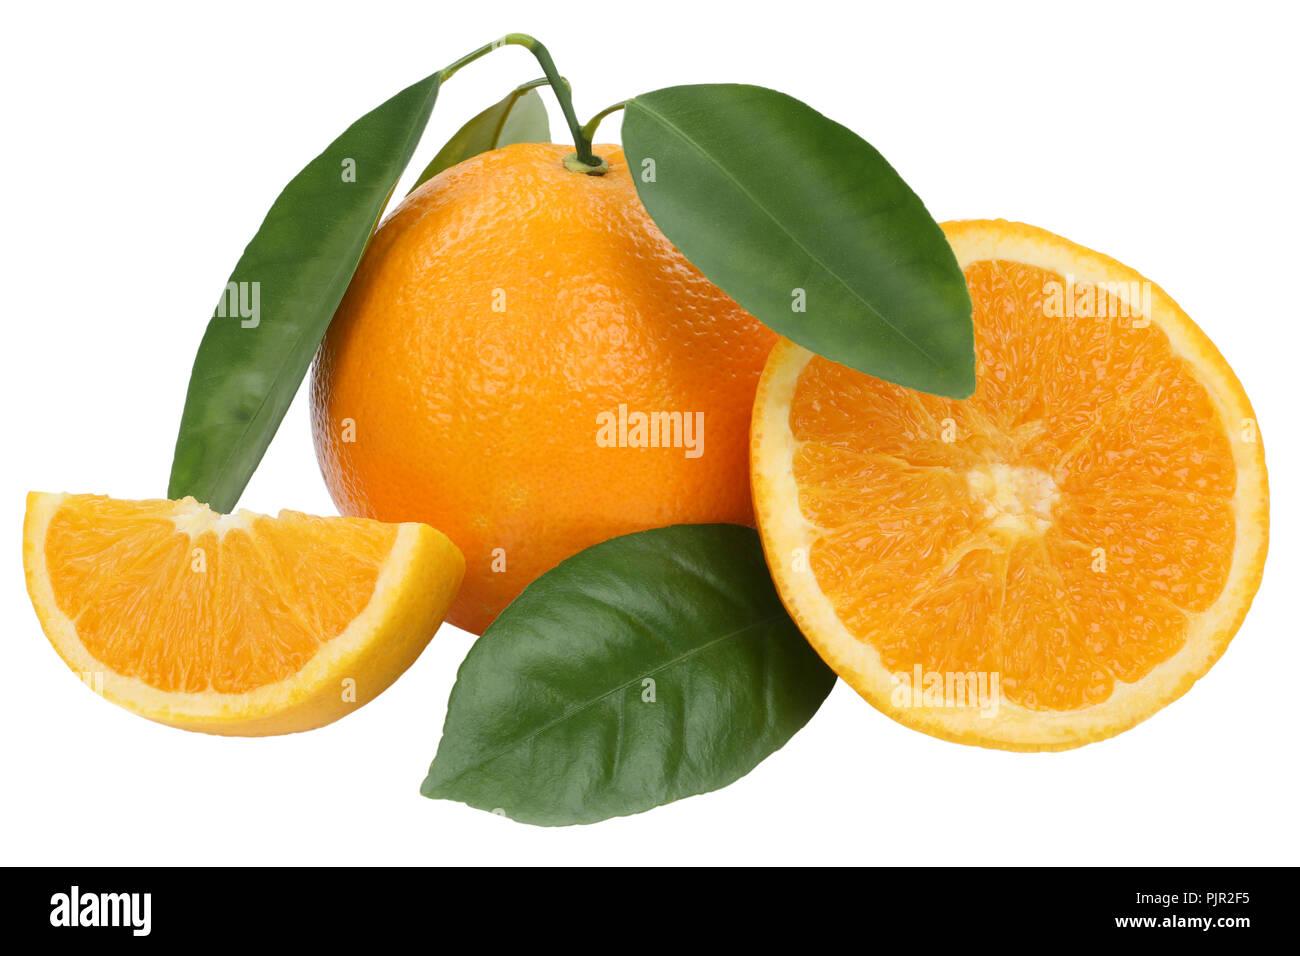 Orange fruit oranges with leaves isolated on a white background - Stock Image